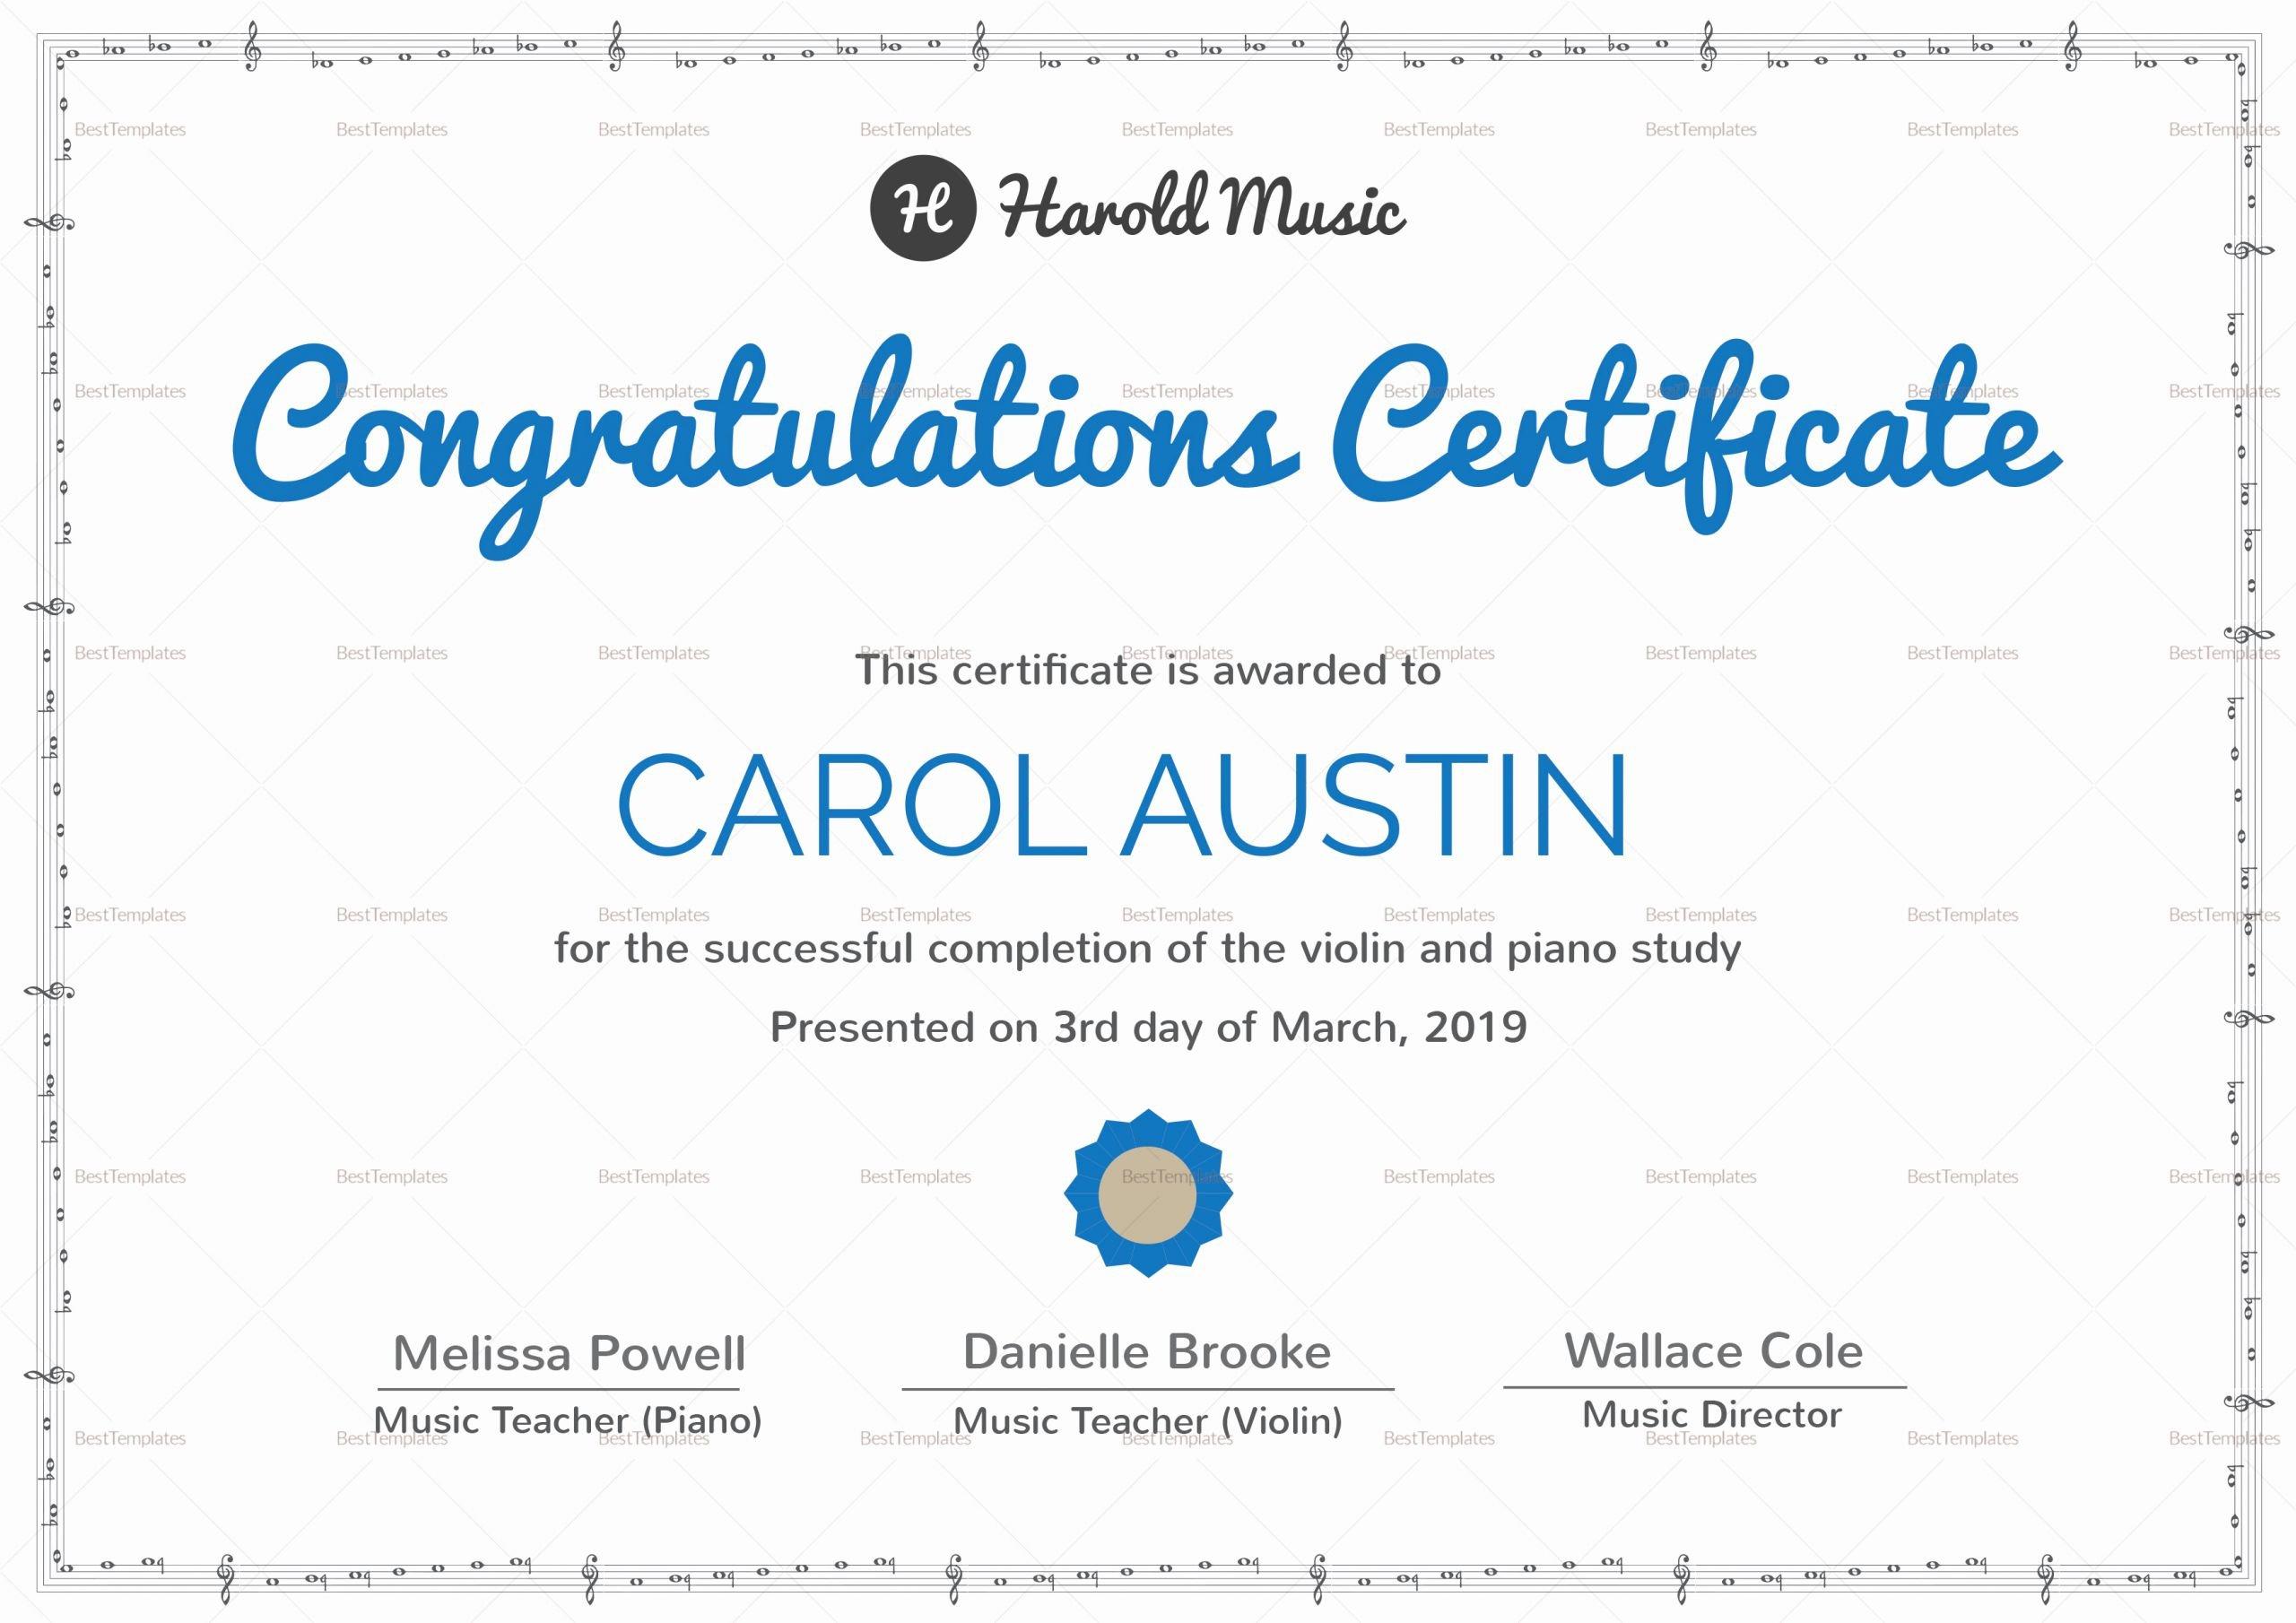 Free Music Certificate Templates Unique Music Training Pletion Certificate Design Template In